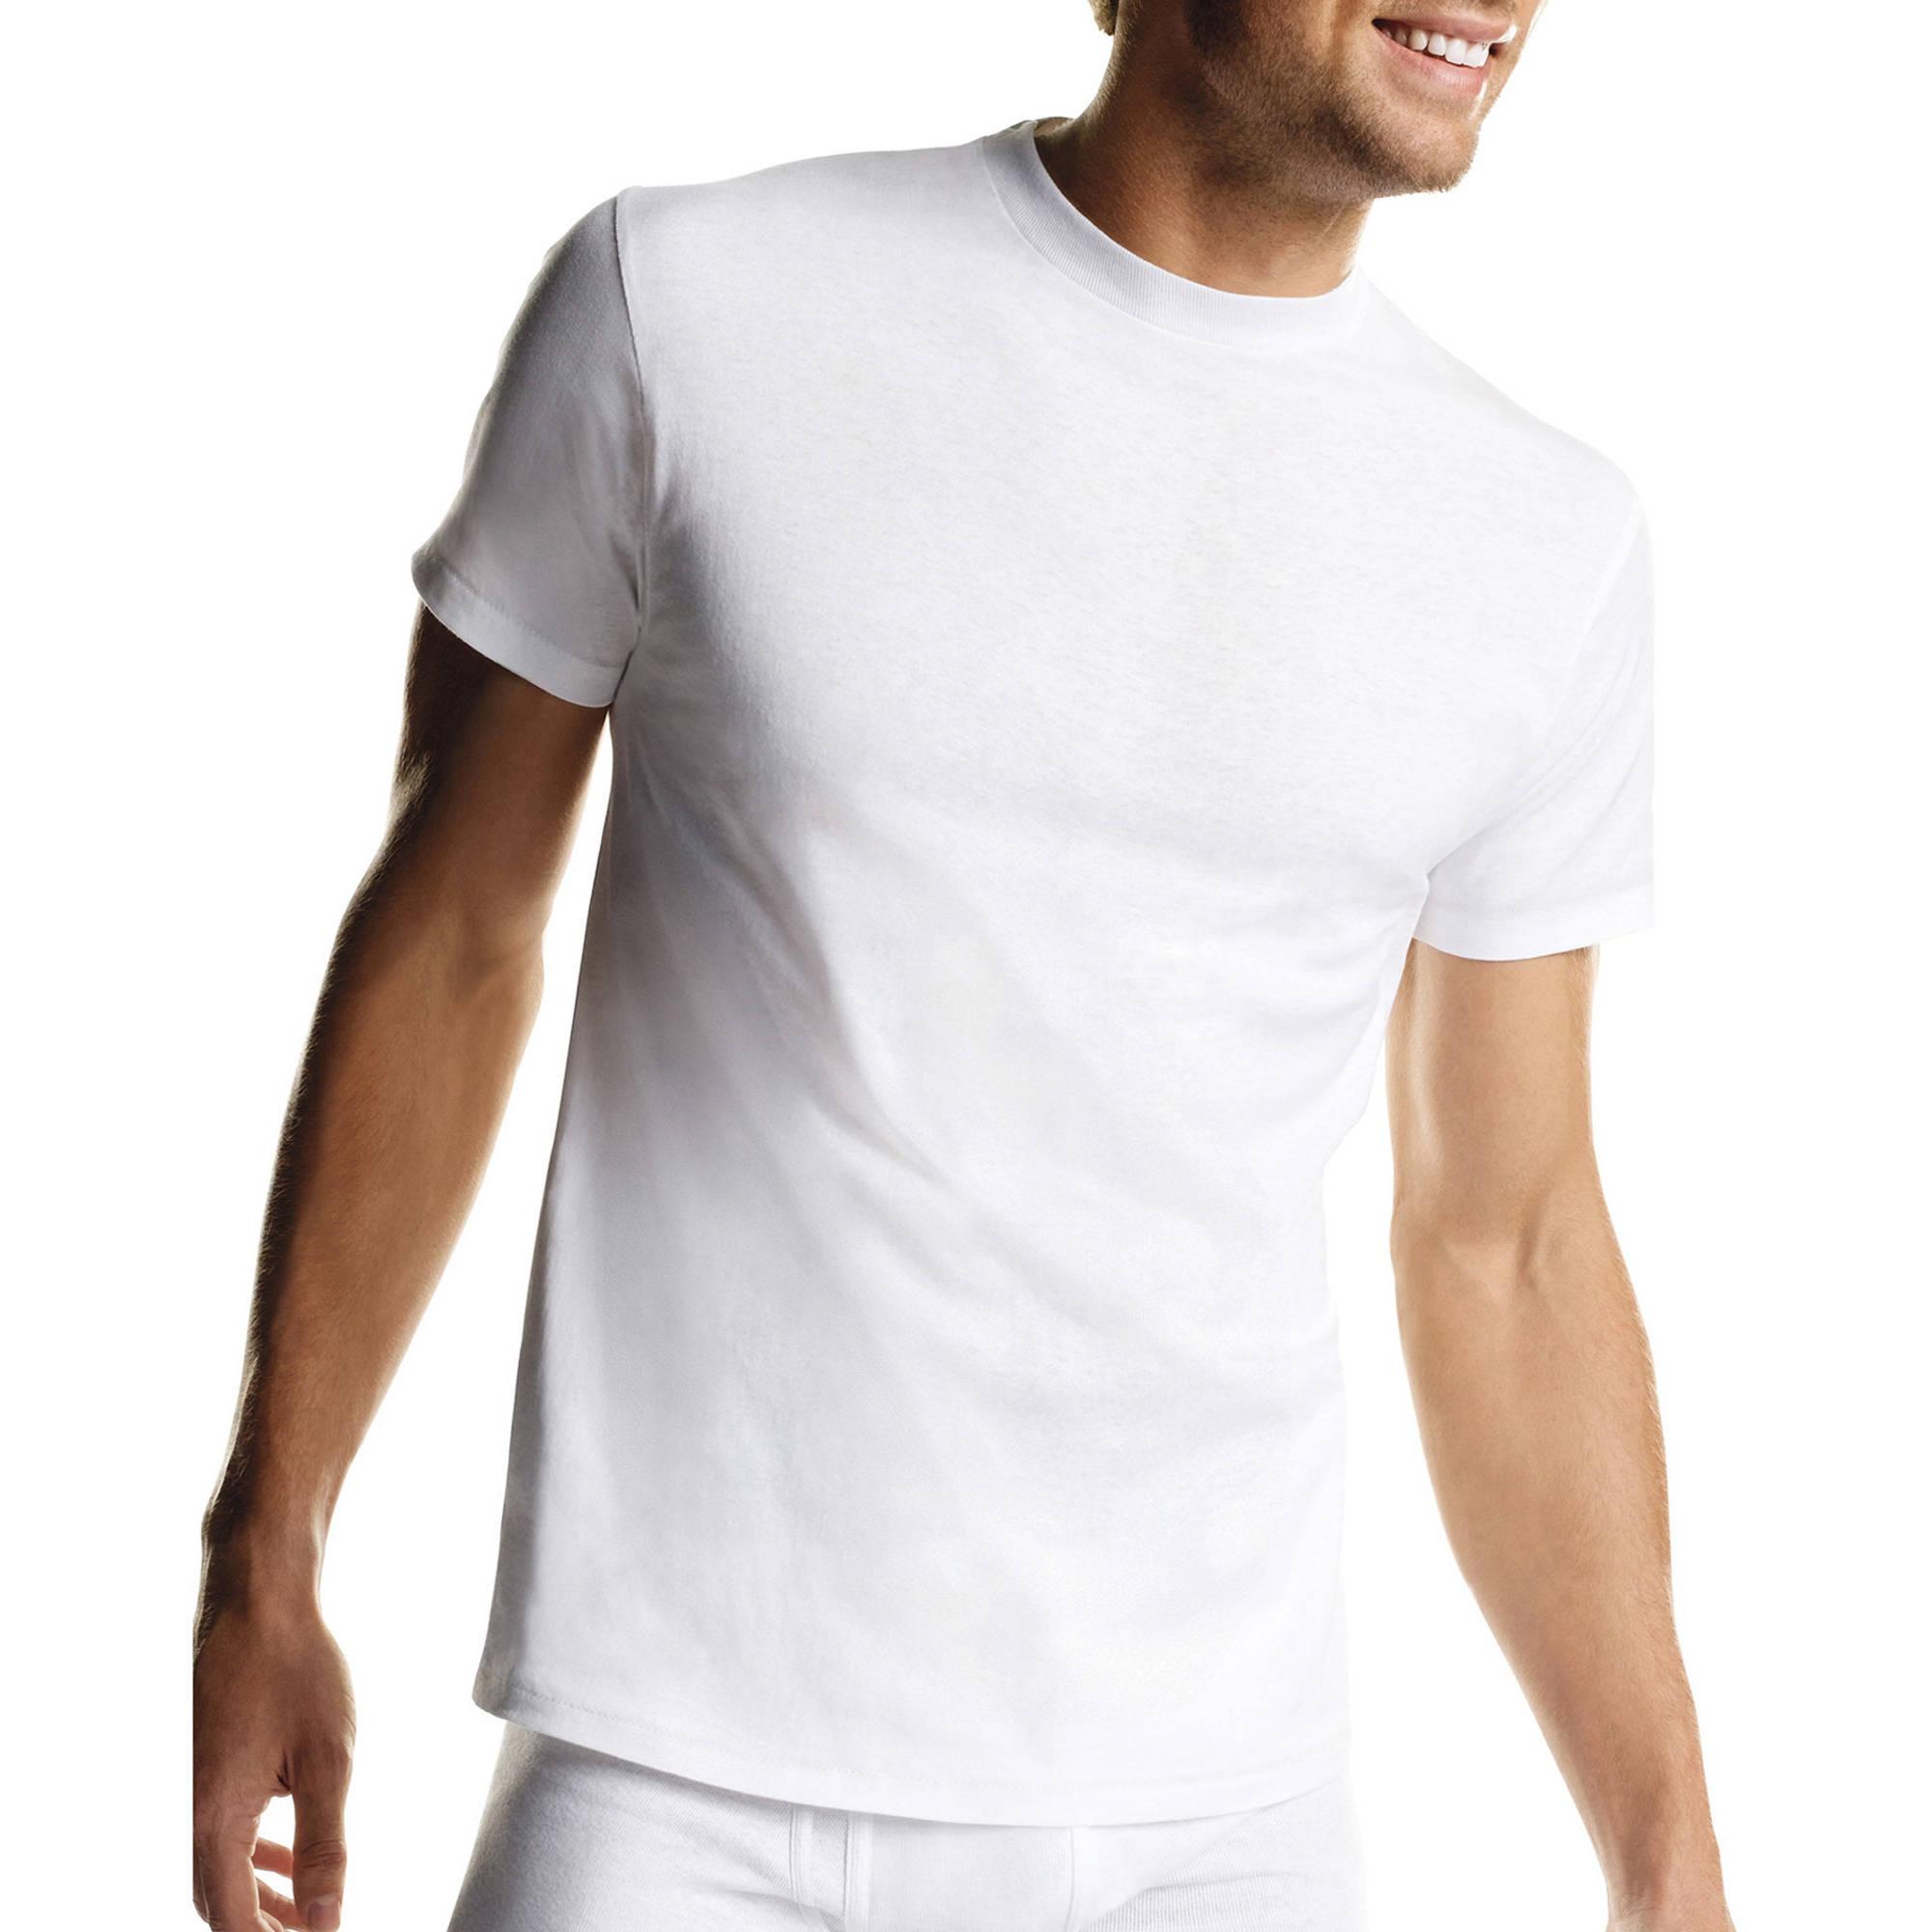 Hanes Mens ComfortSoft White Crew Neck T-Shirt SUPER VALUE 10-Pack